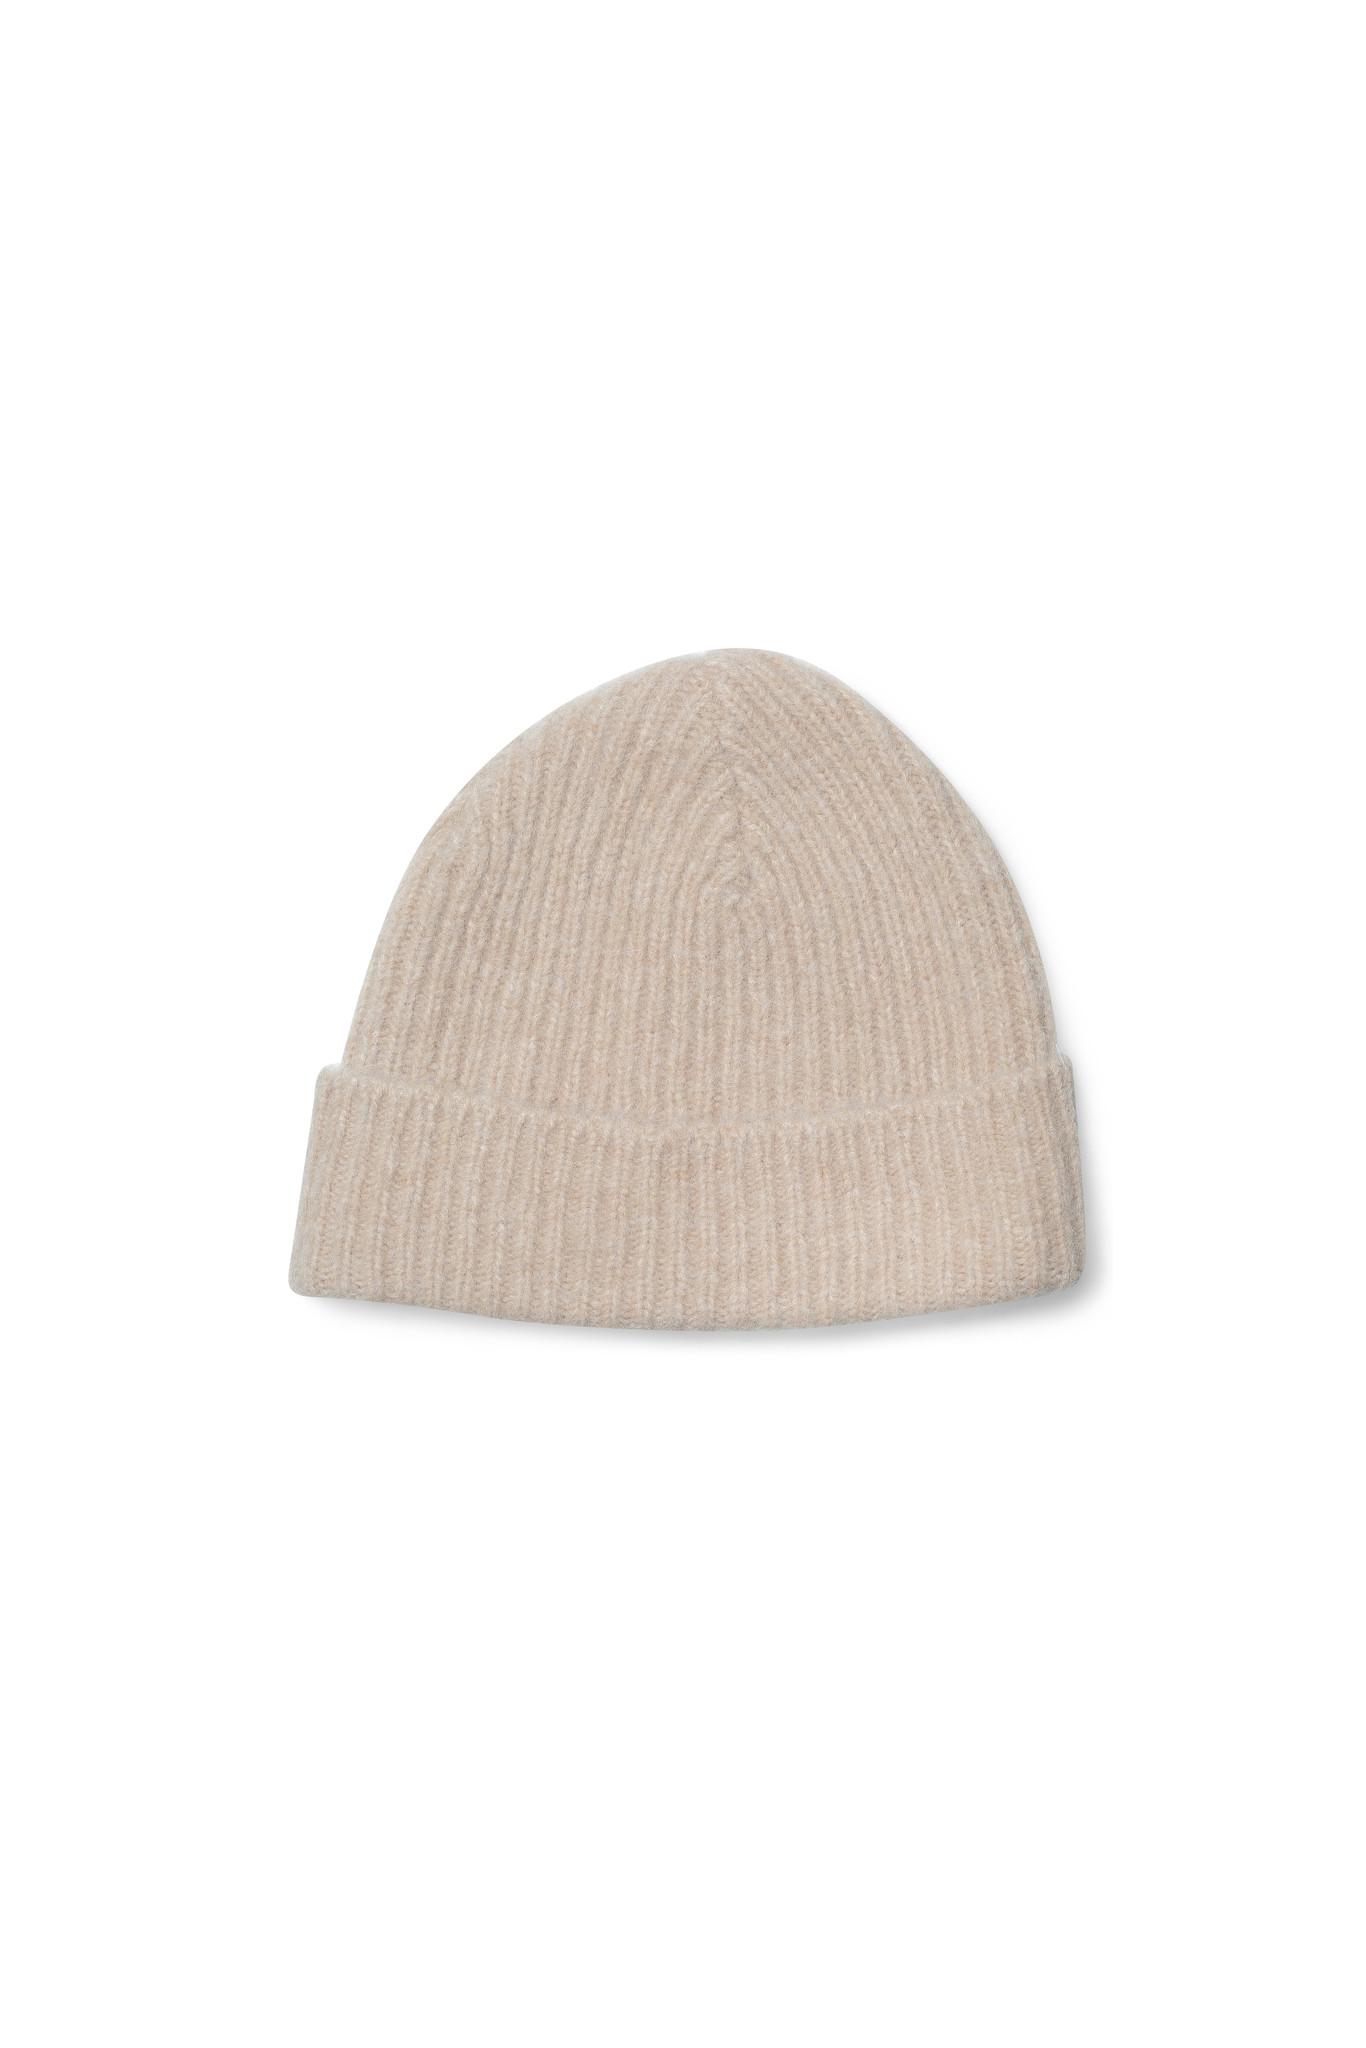 Berg Hat - Camel-1